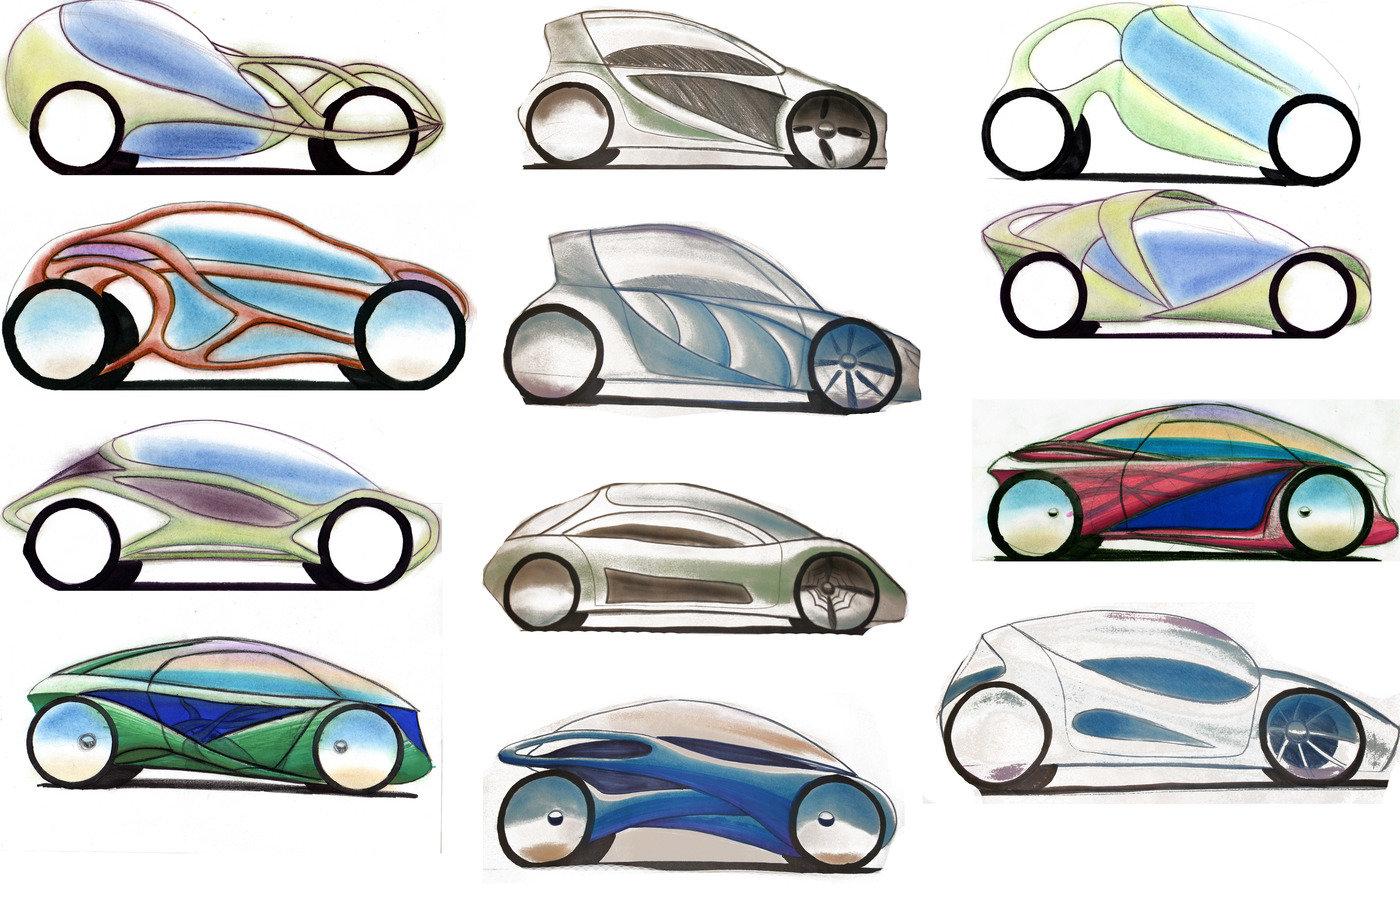 Sabic Innovative Plastics by Robert Rowell at Coroflot com